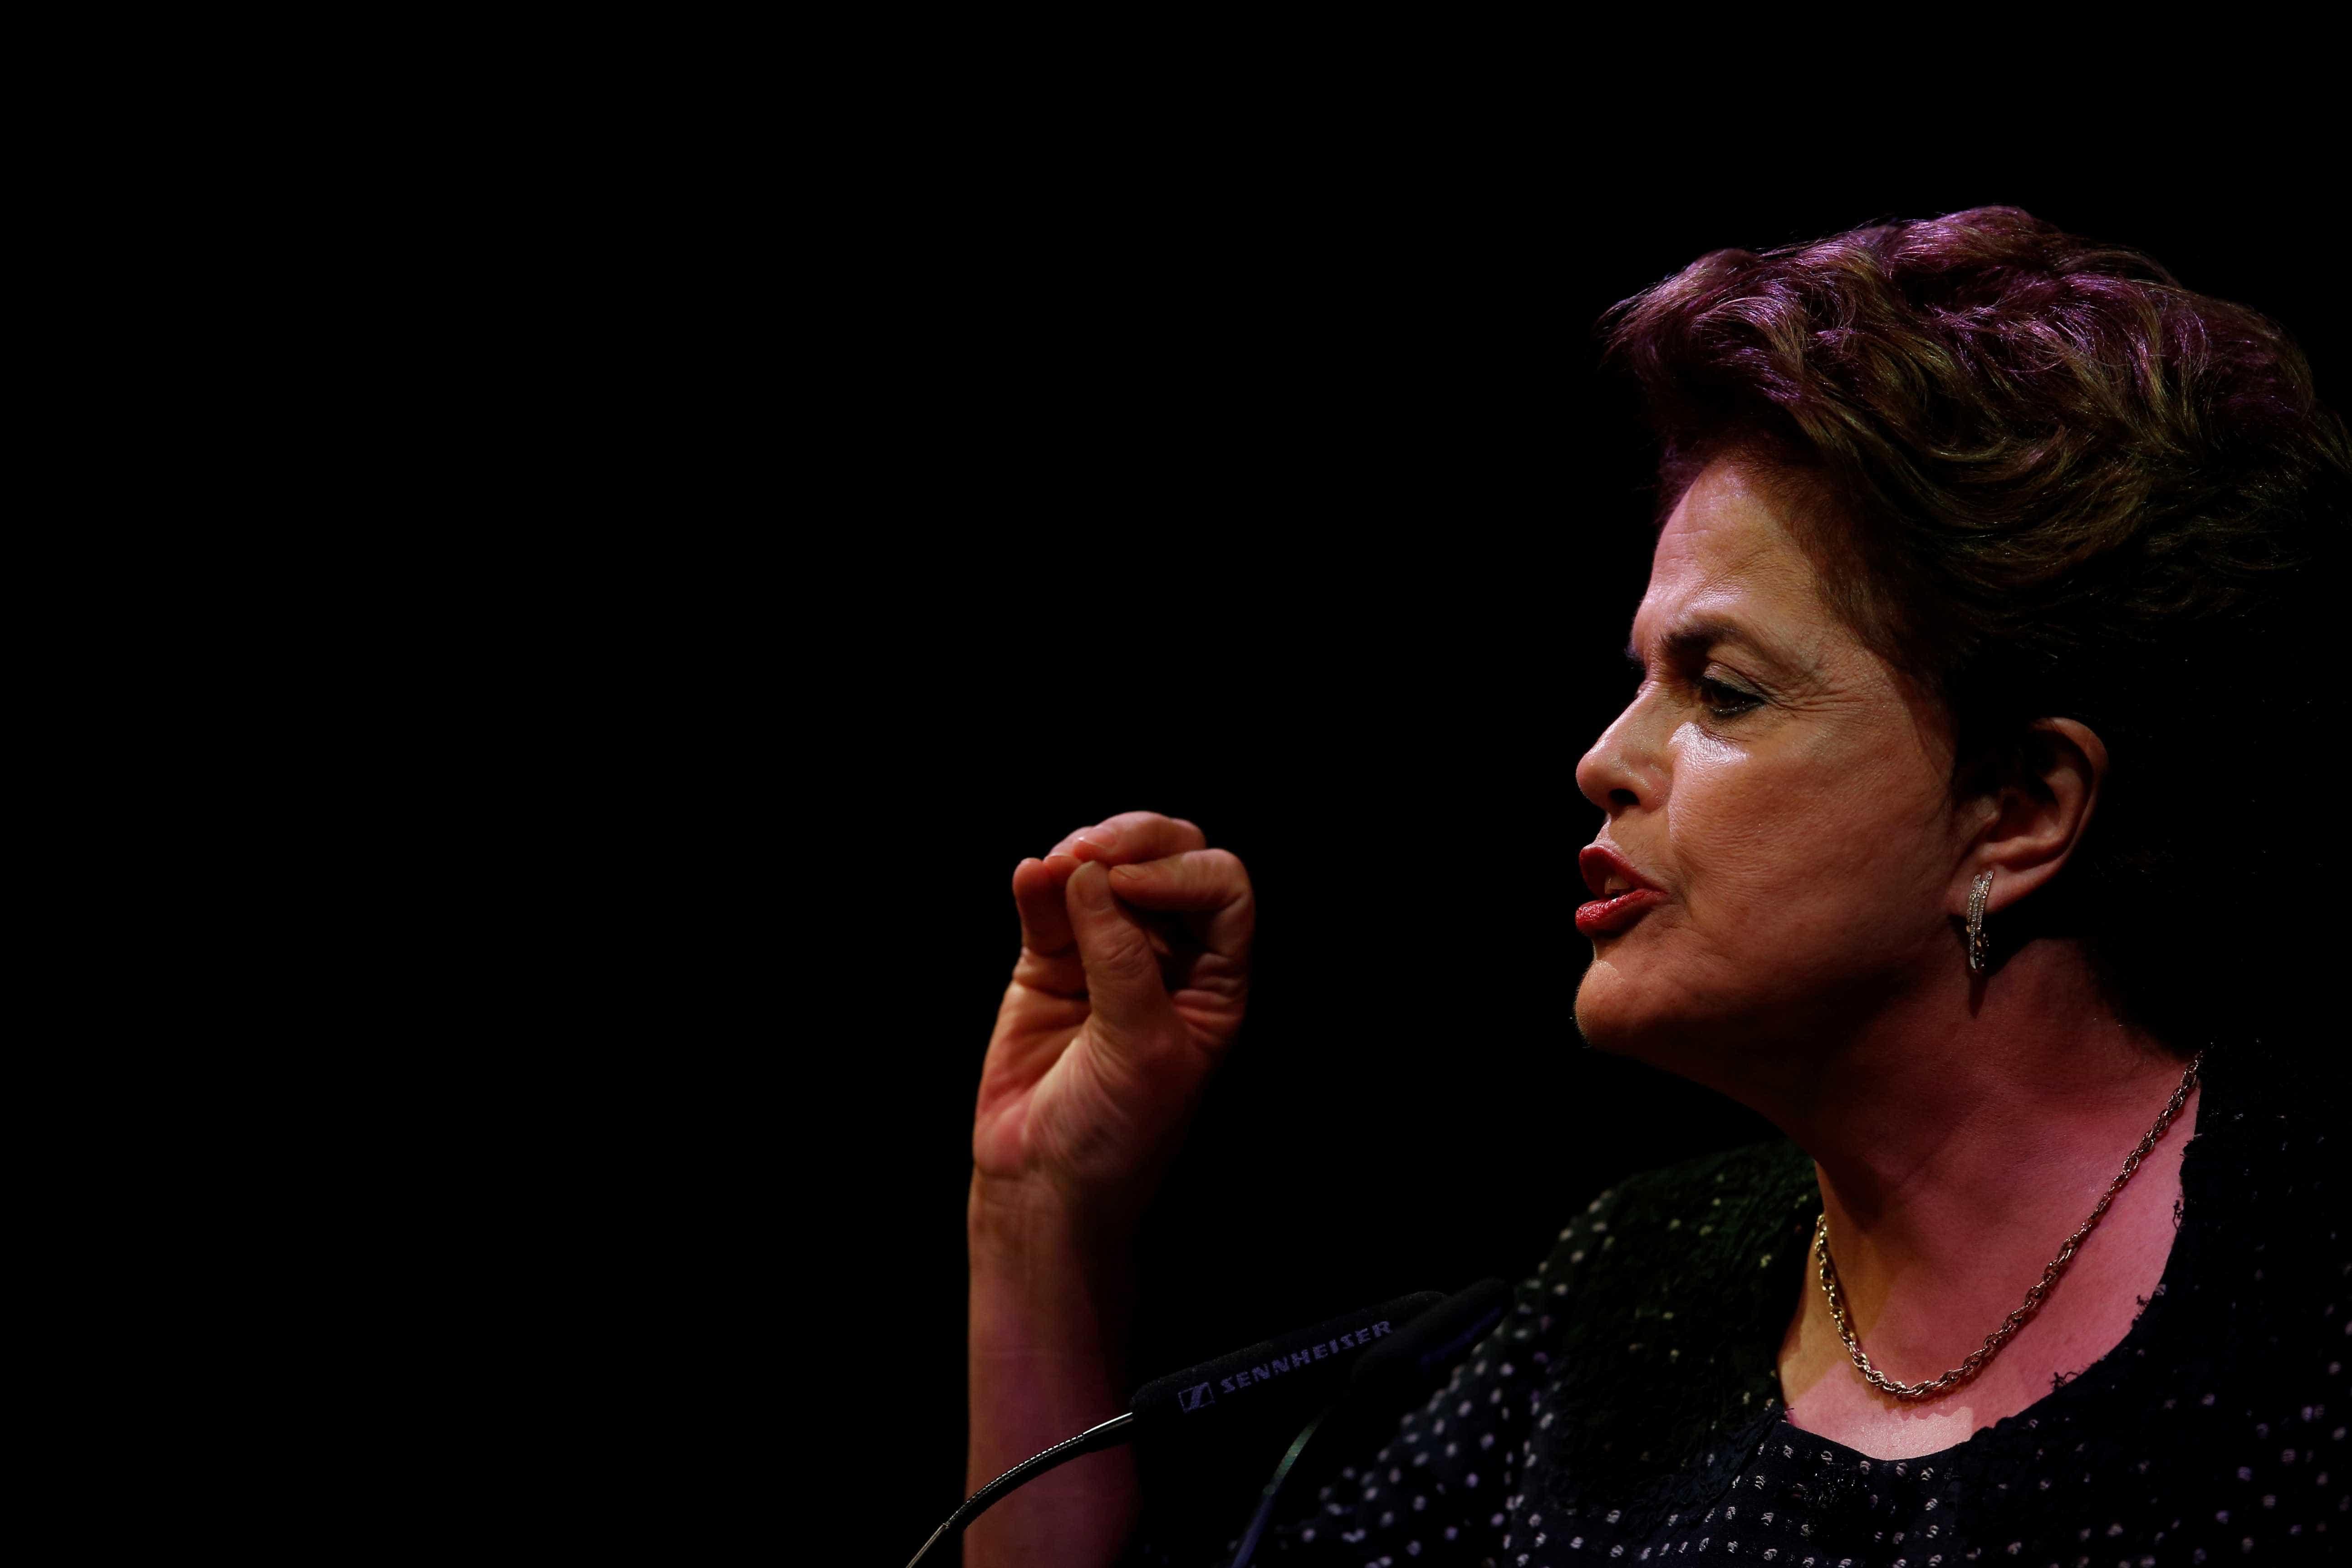 PT formaliza candidatura de Dilma Rousseff ao Senado